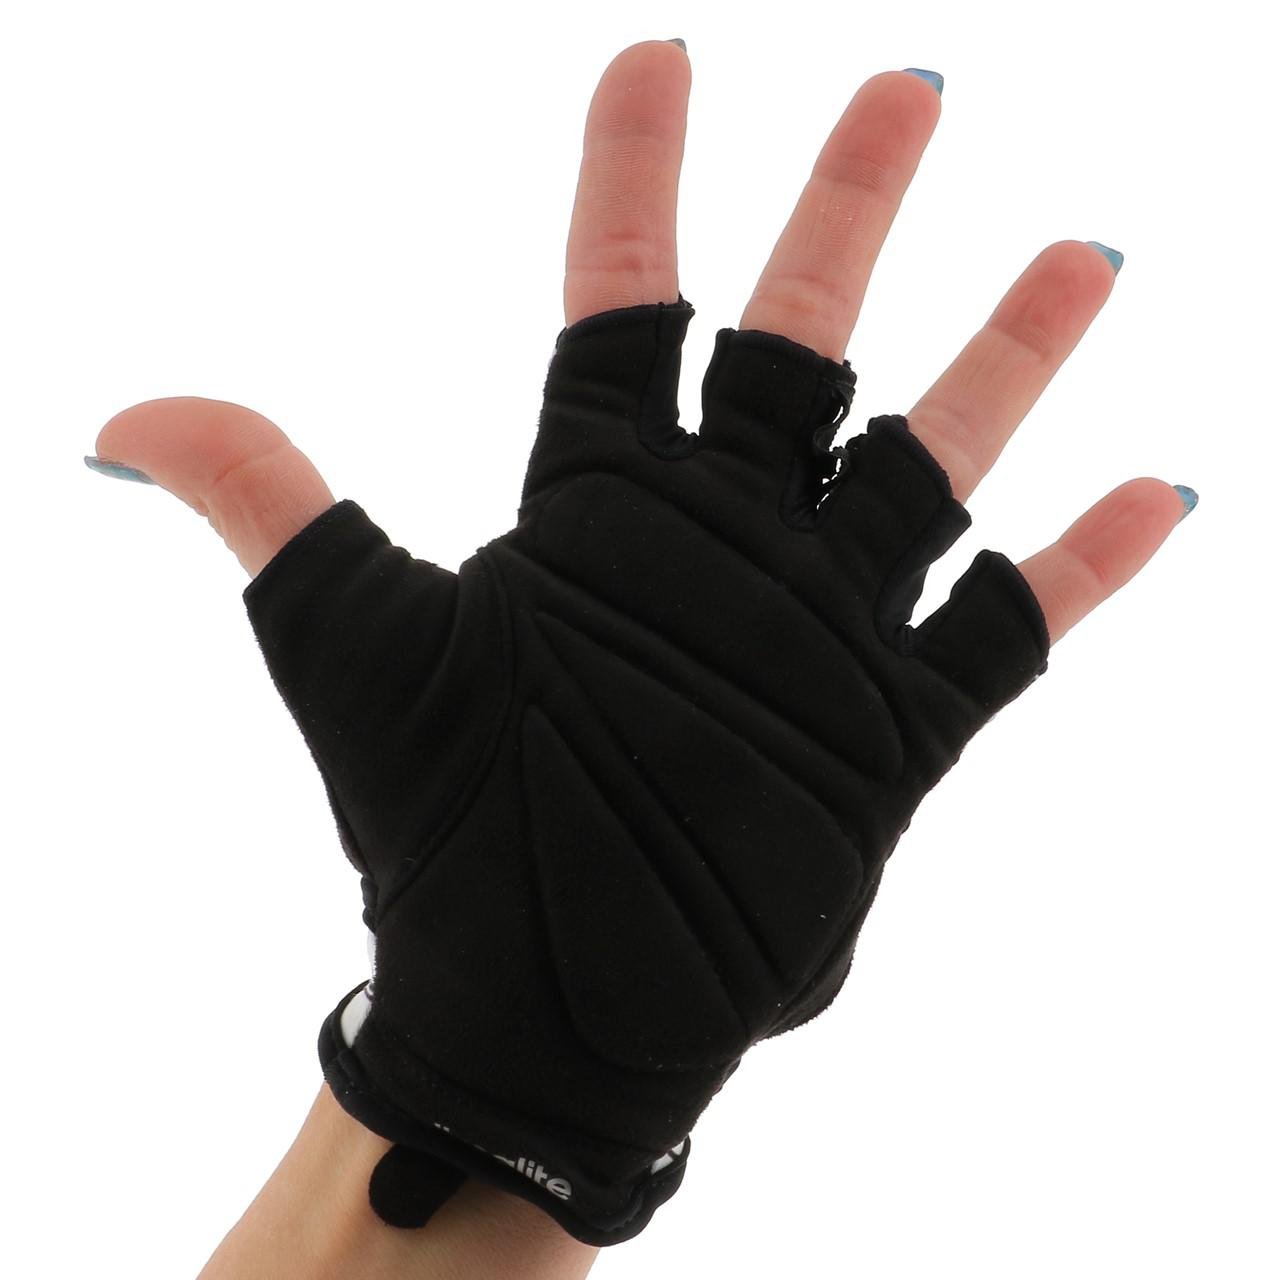 Mitaine-Adidas-Clite-training-femme-Blanc-49309-Neuf miniature 5